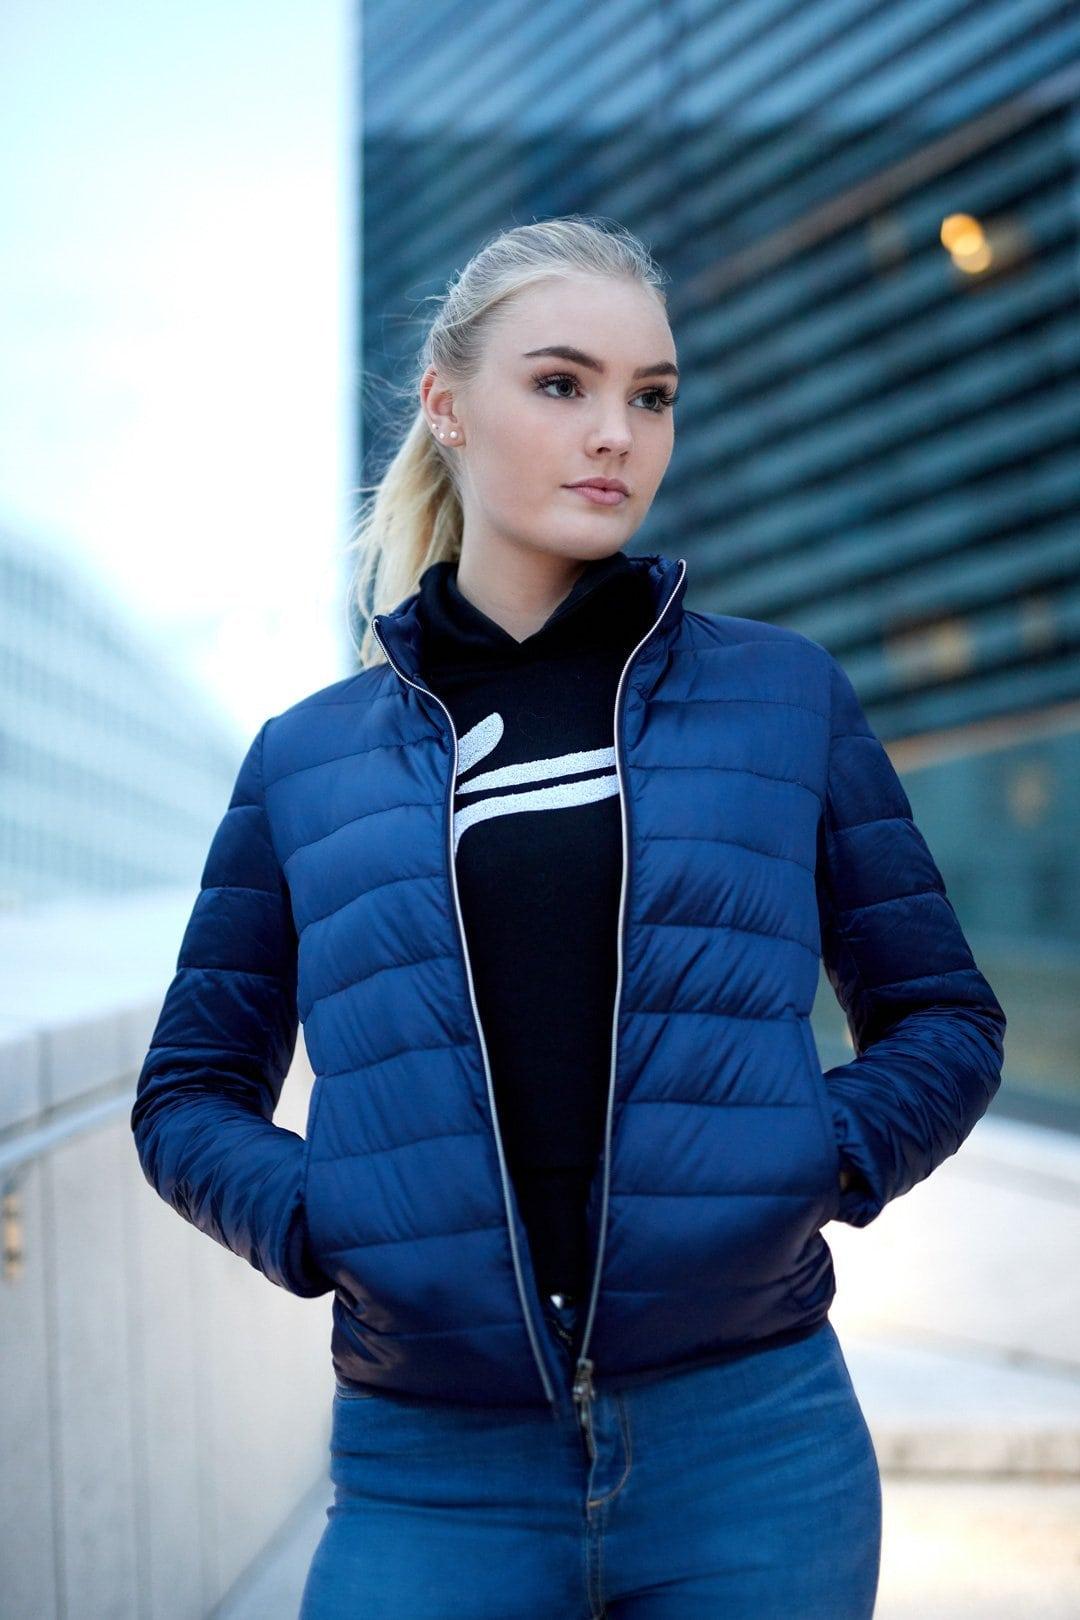 FAMME Navy Blue Caliente Jacket citj-nb b